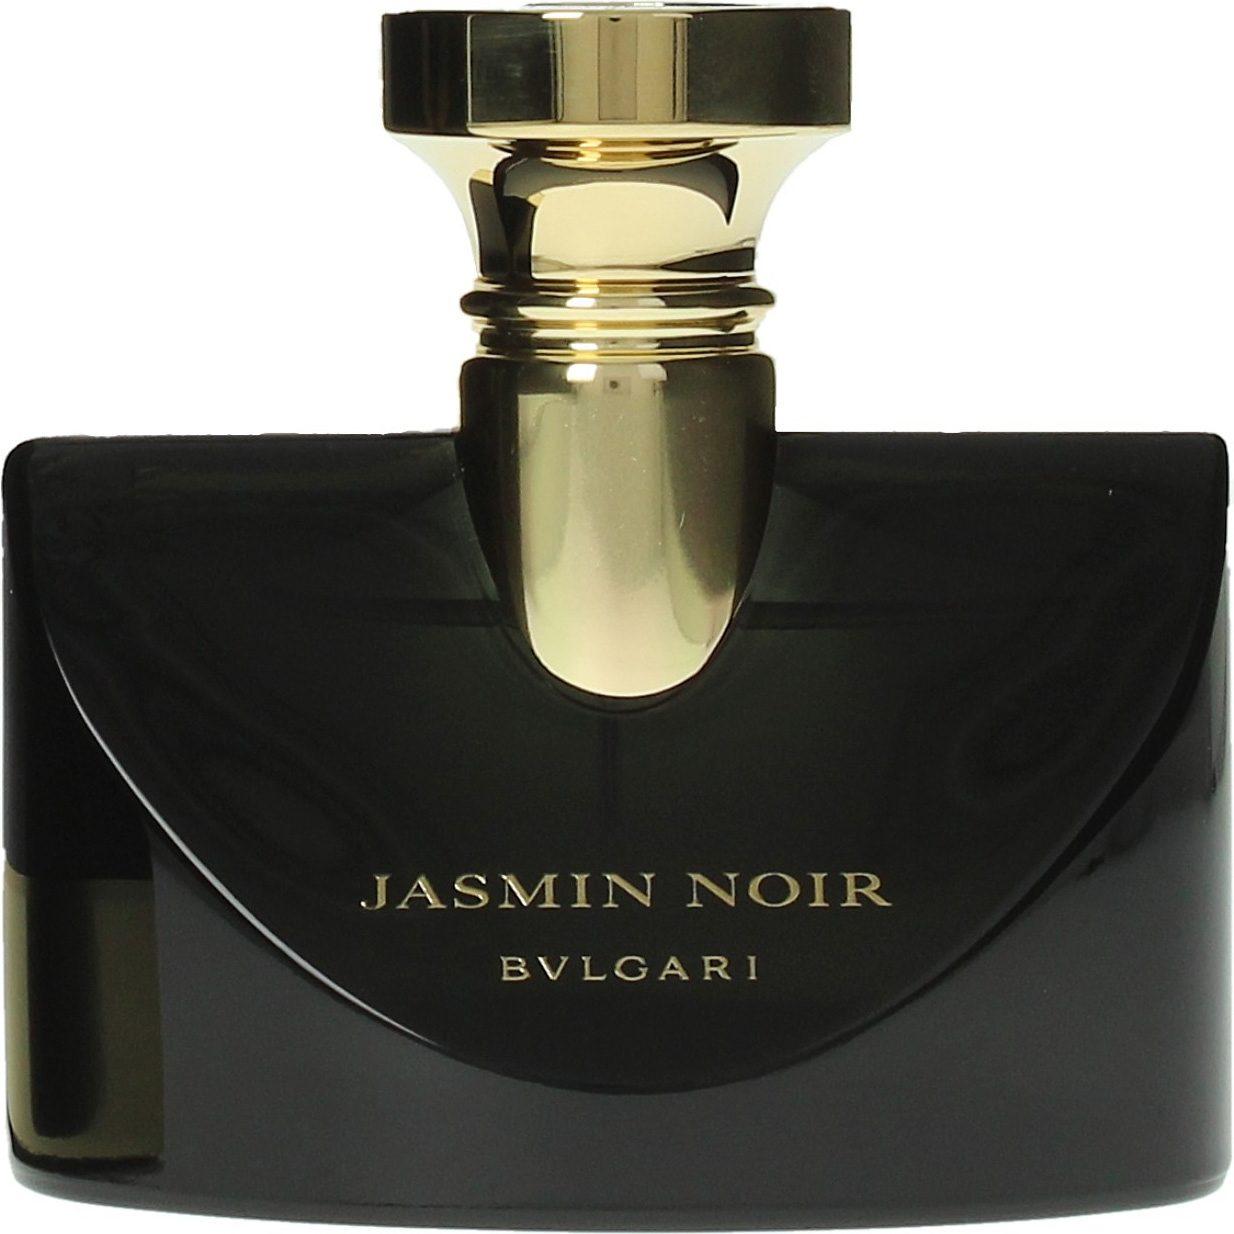 Bvlgari, »Jasmin Noir«, Eau de Parfum